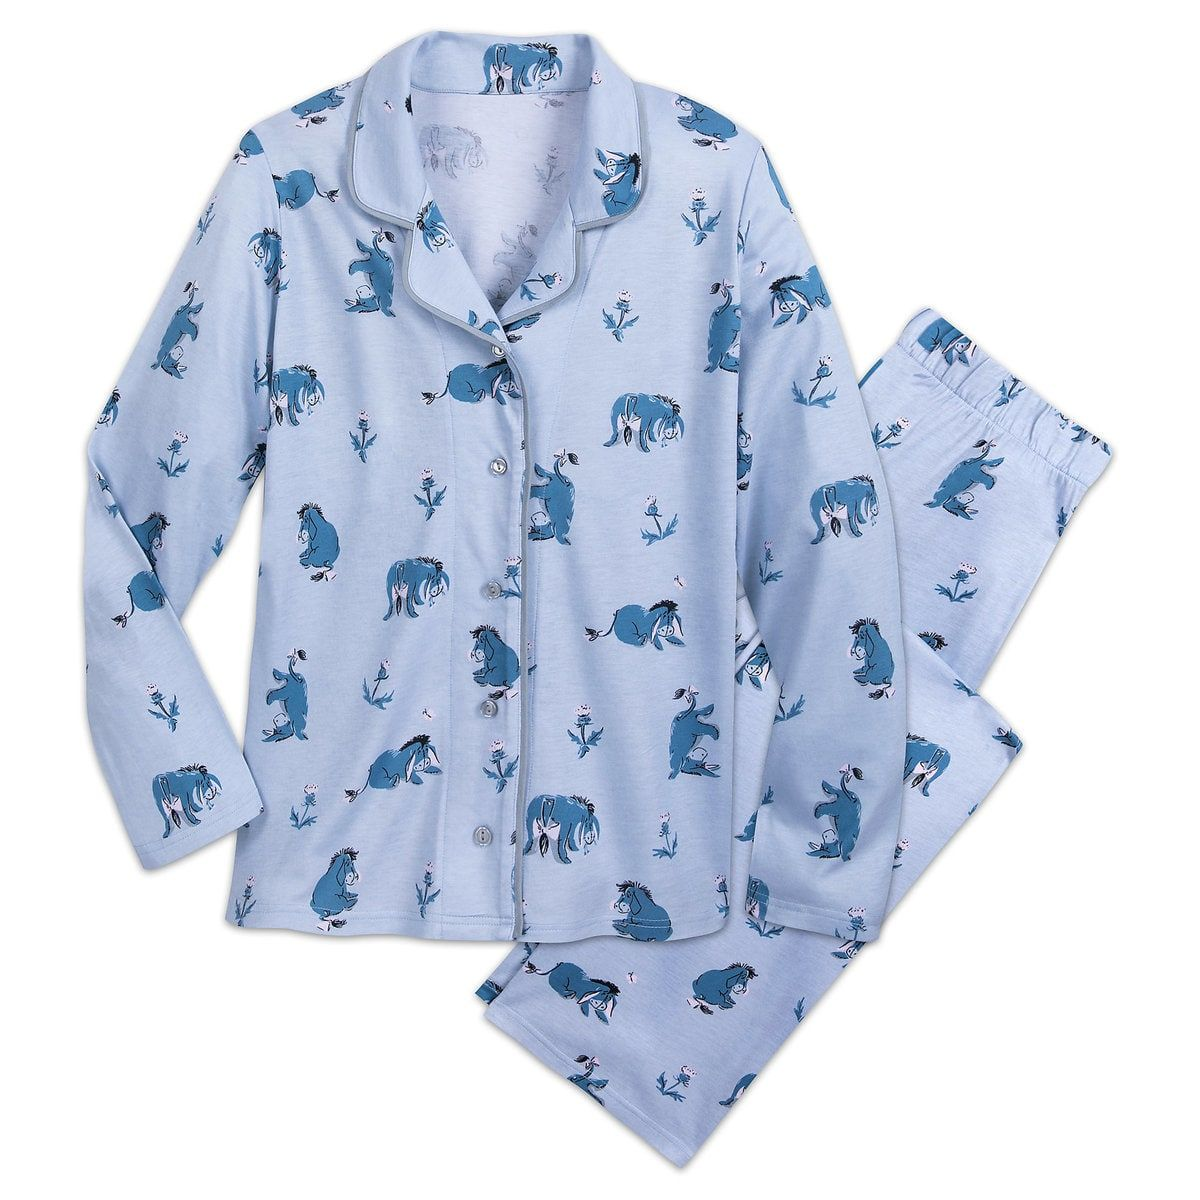 a0c4dfee8 Eeyore Pajama Coat Set for Women by Munki Munki in 2019 | Clothing I ...